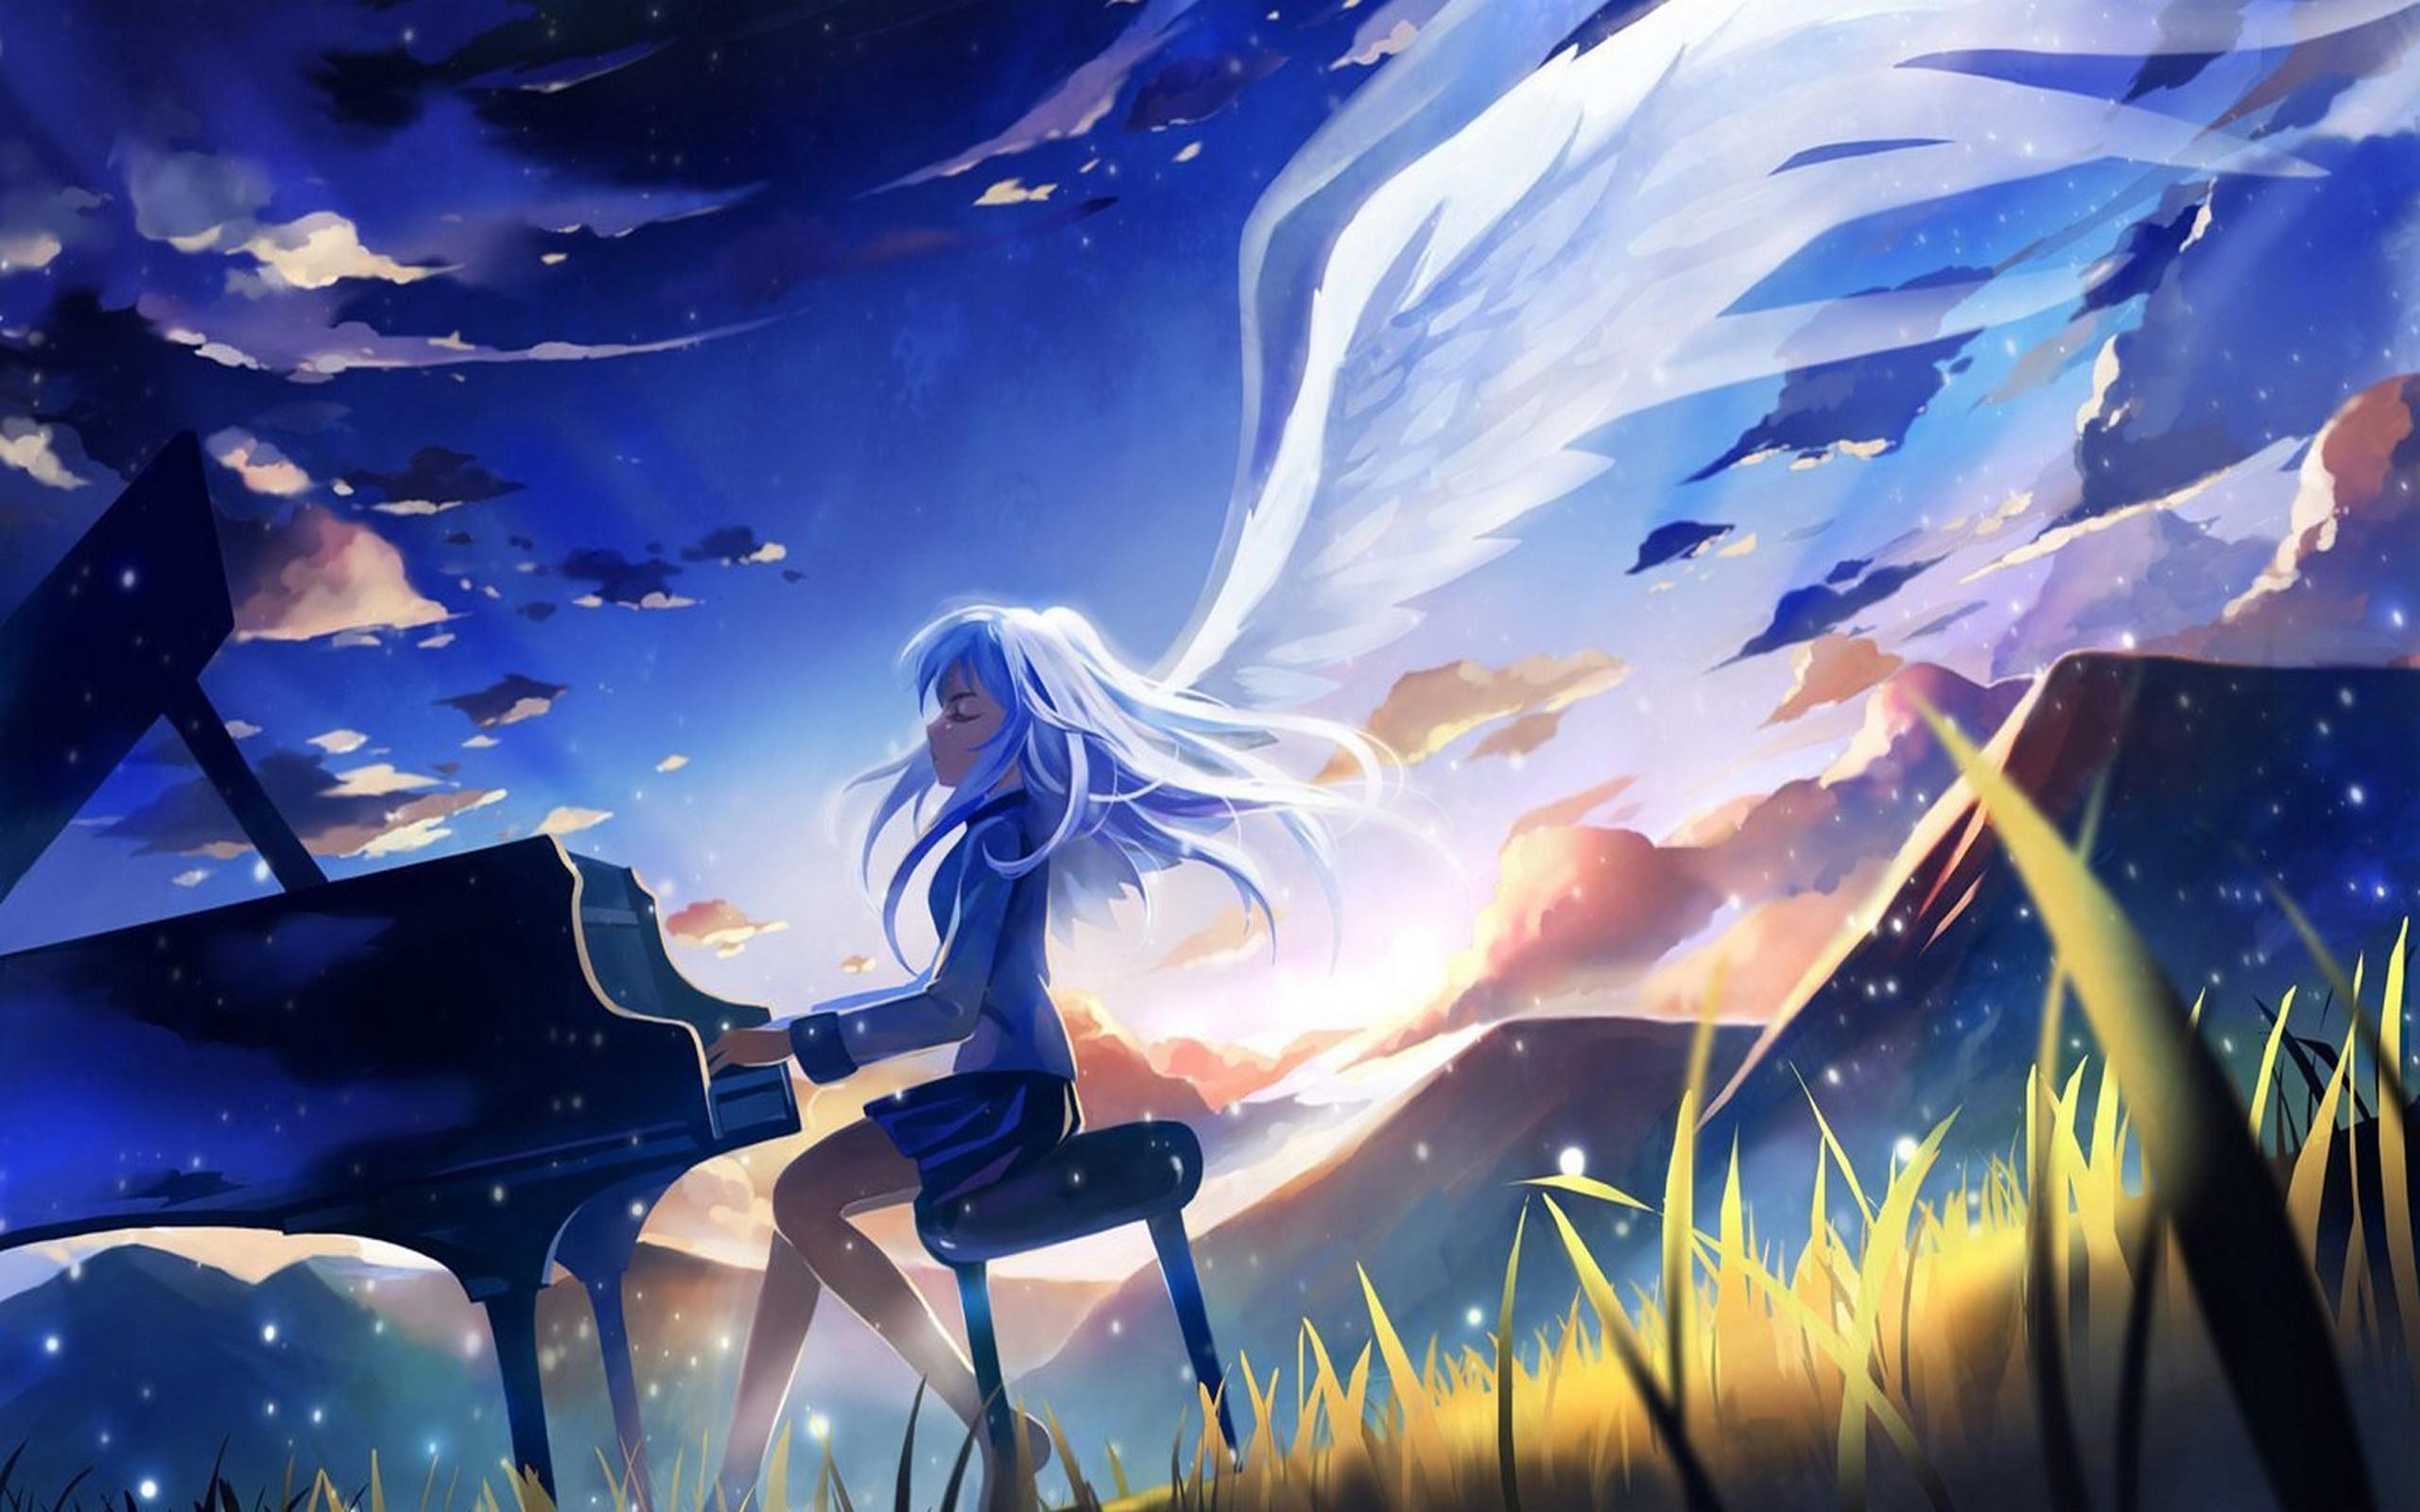 anime-angel-hd-wallpaper-free